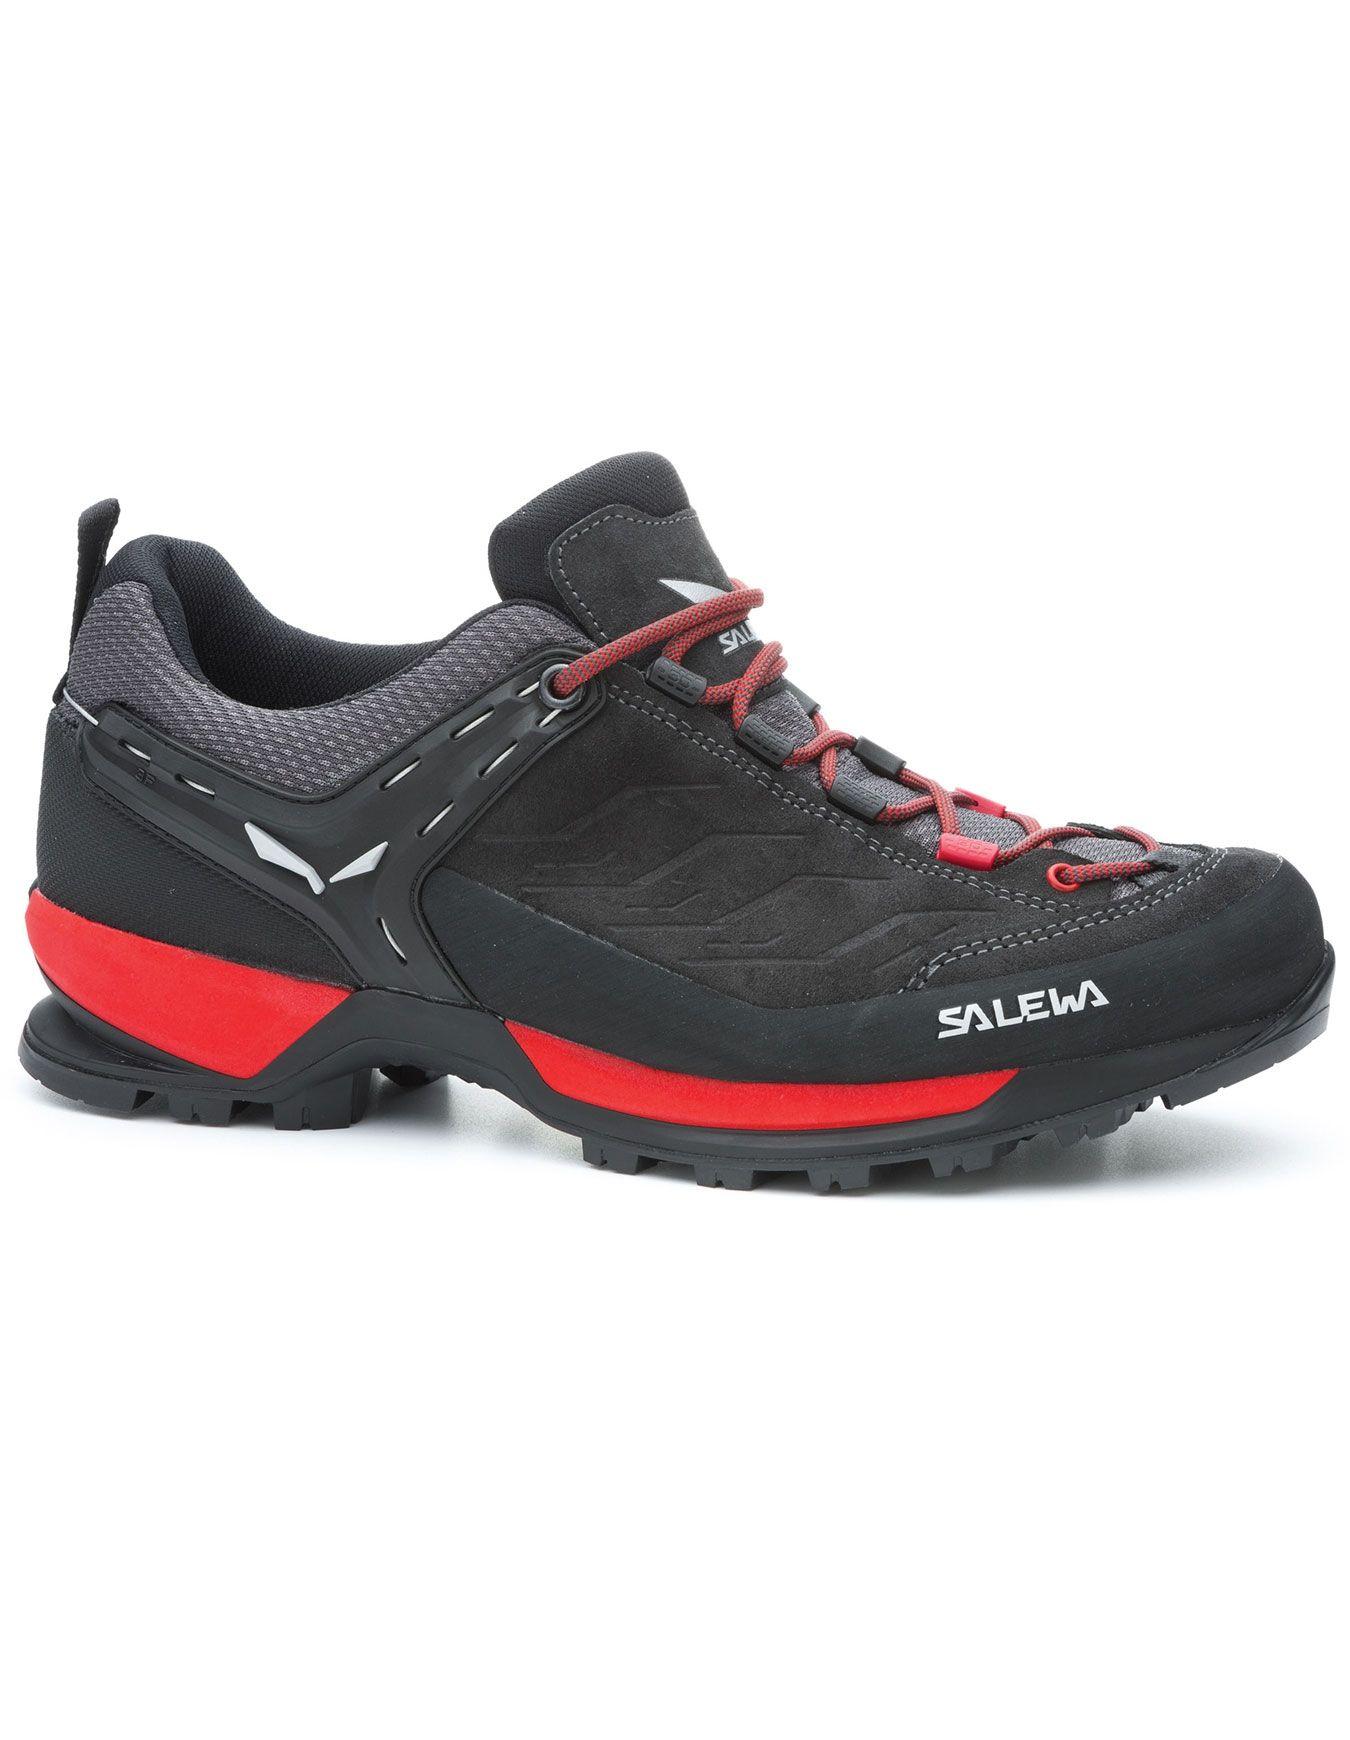 Ms MTN Trainer Black Out/Bergot Salewa : Chaussures randonnée ...